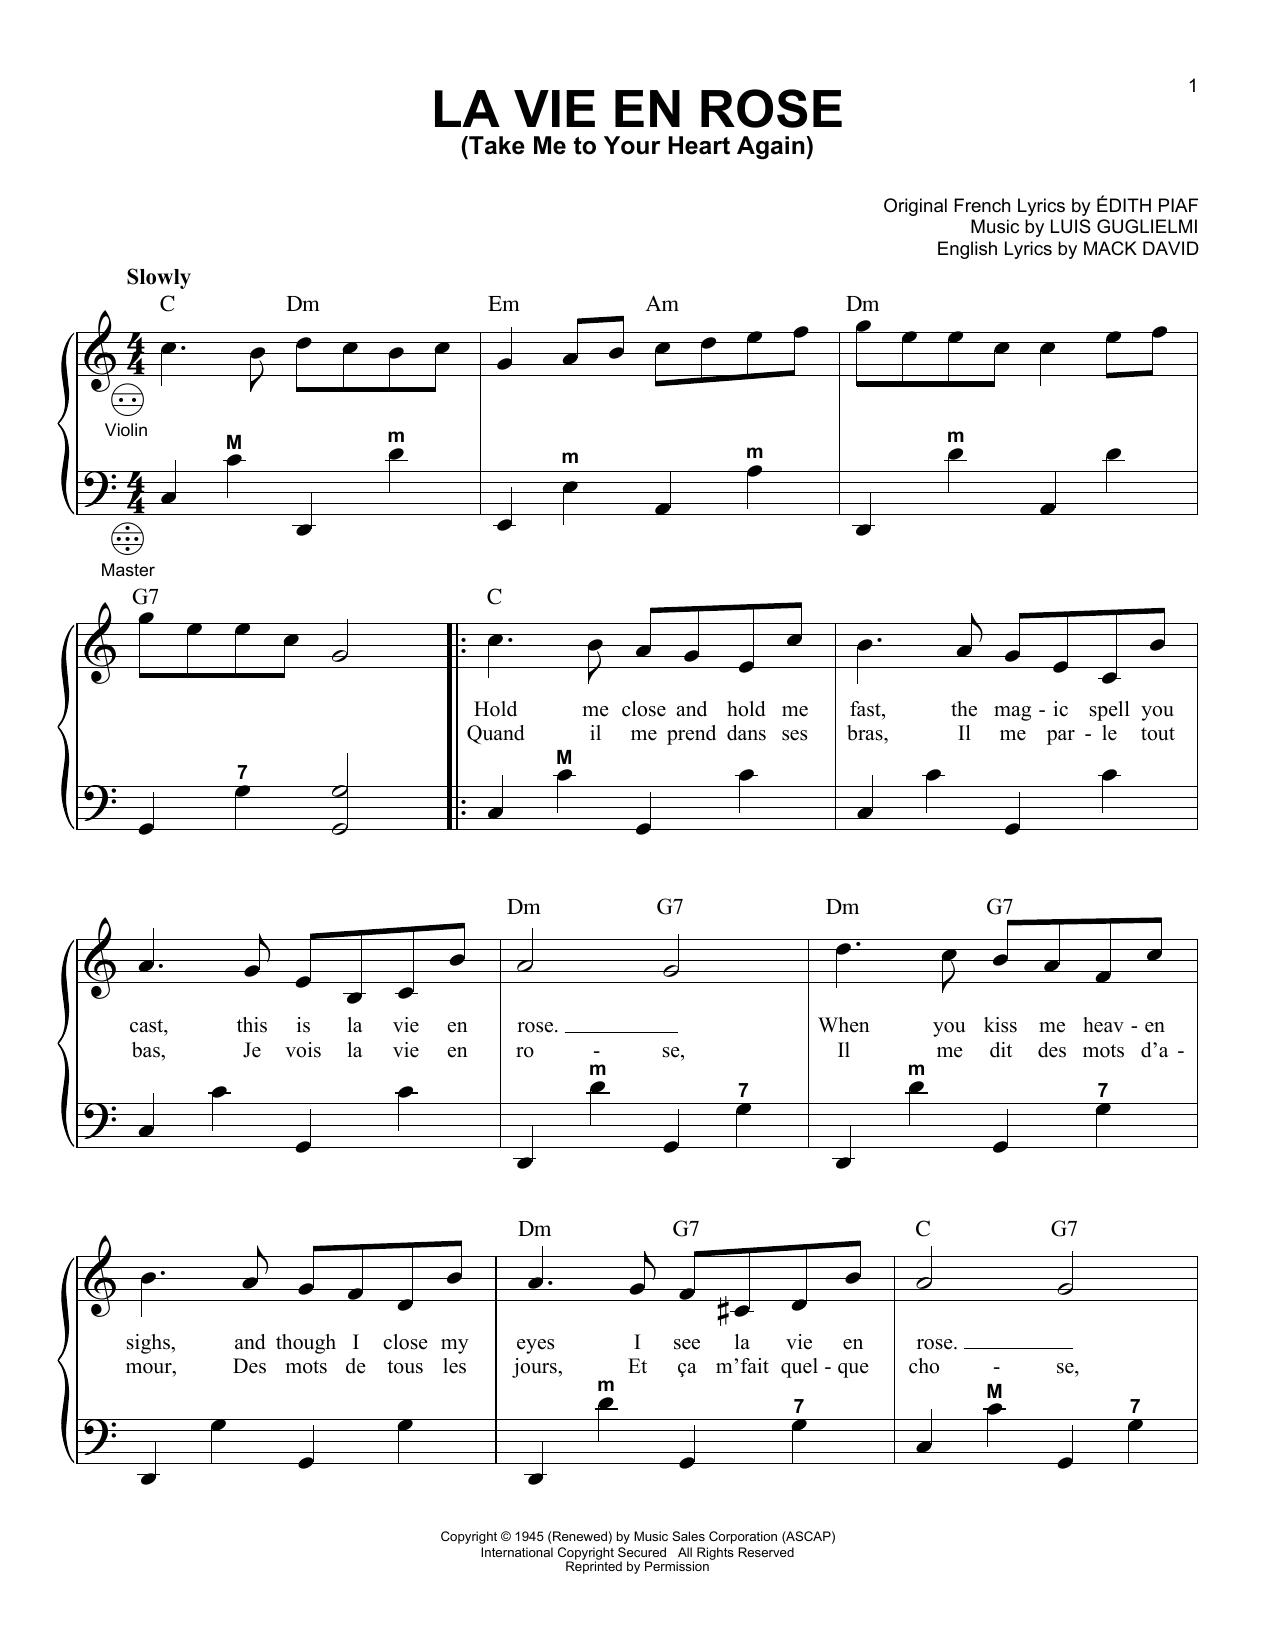 La Vie En Rose Chords La Vie En Rose Take Me To Your Heart Again Accordion Sheet Music